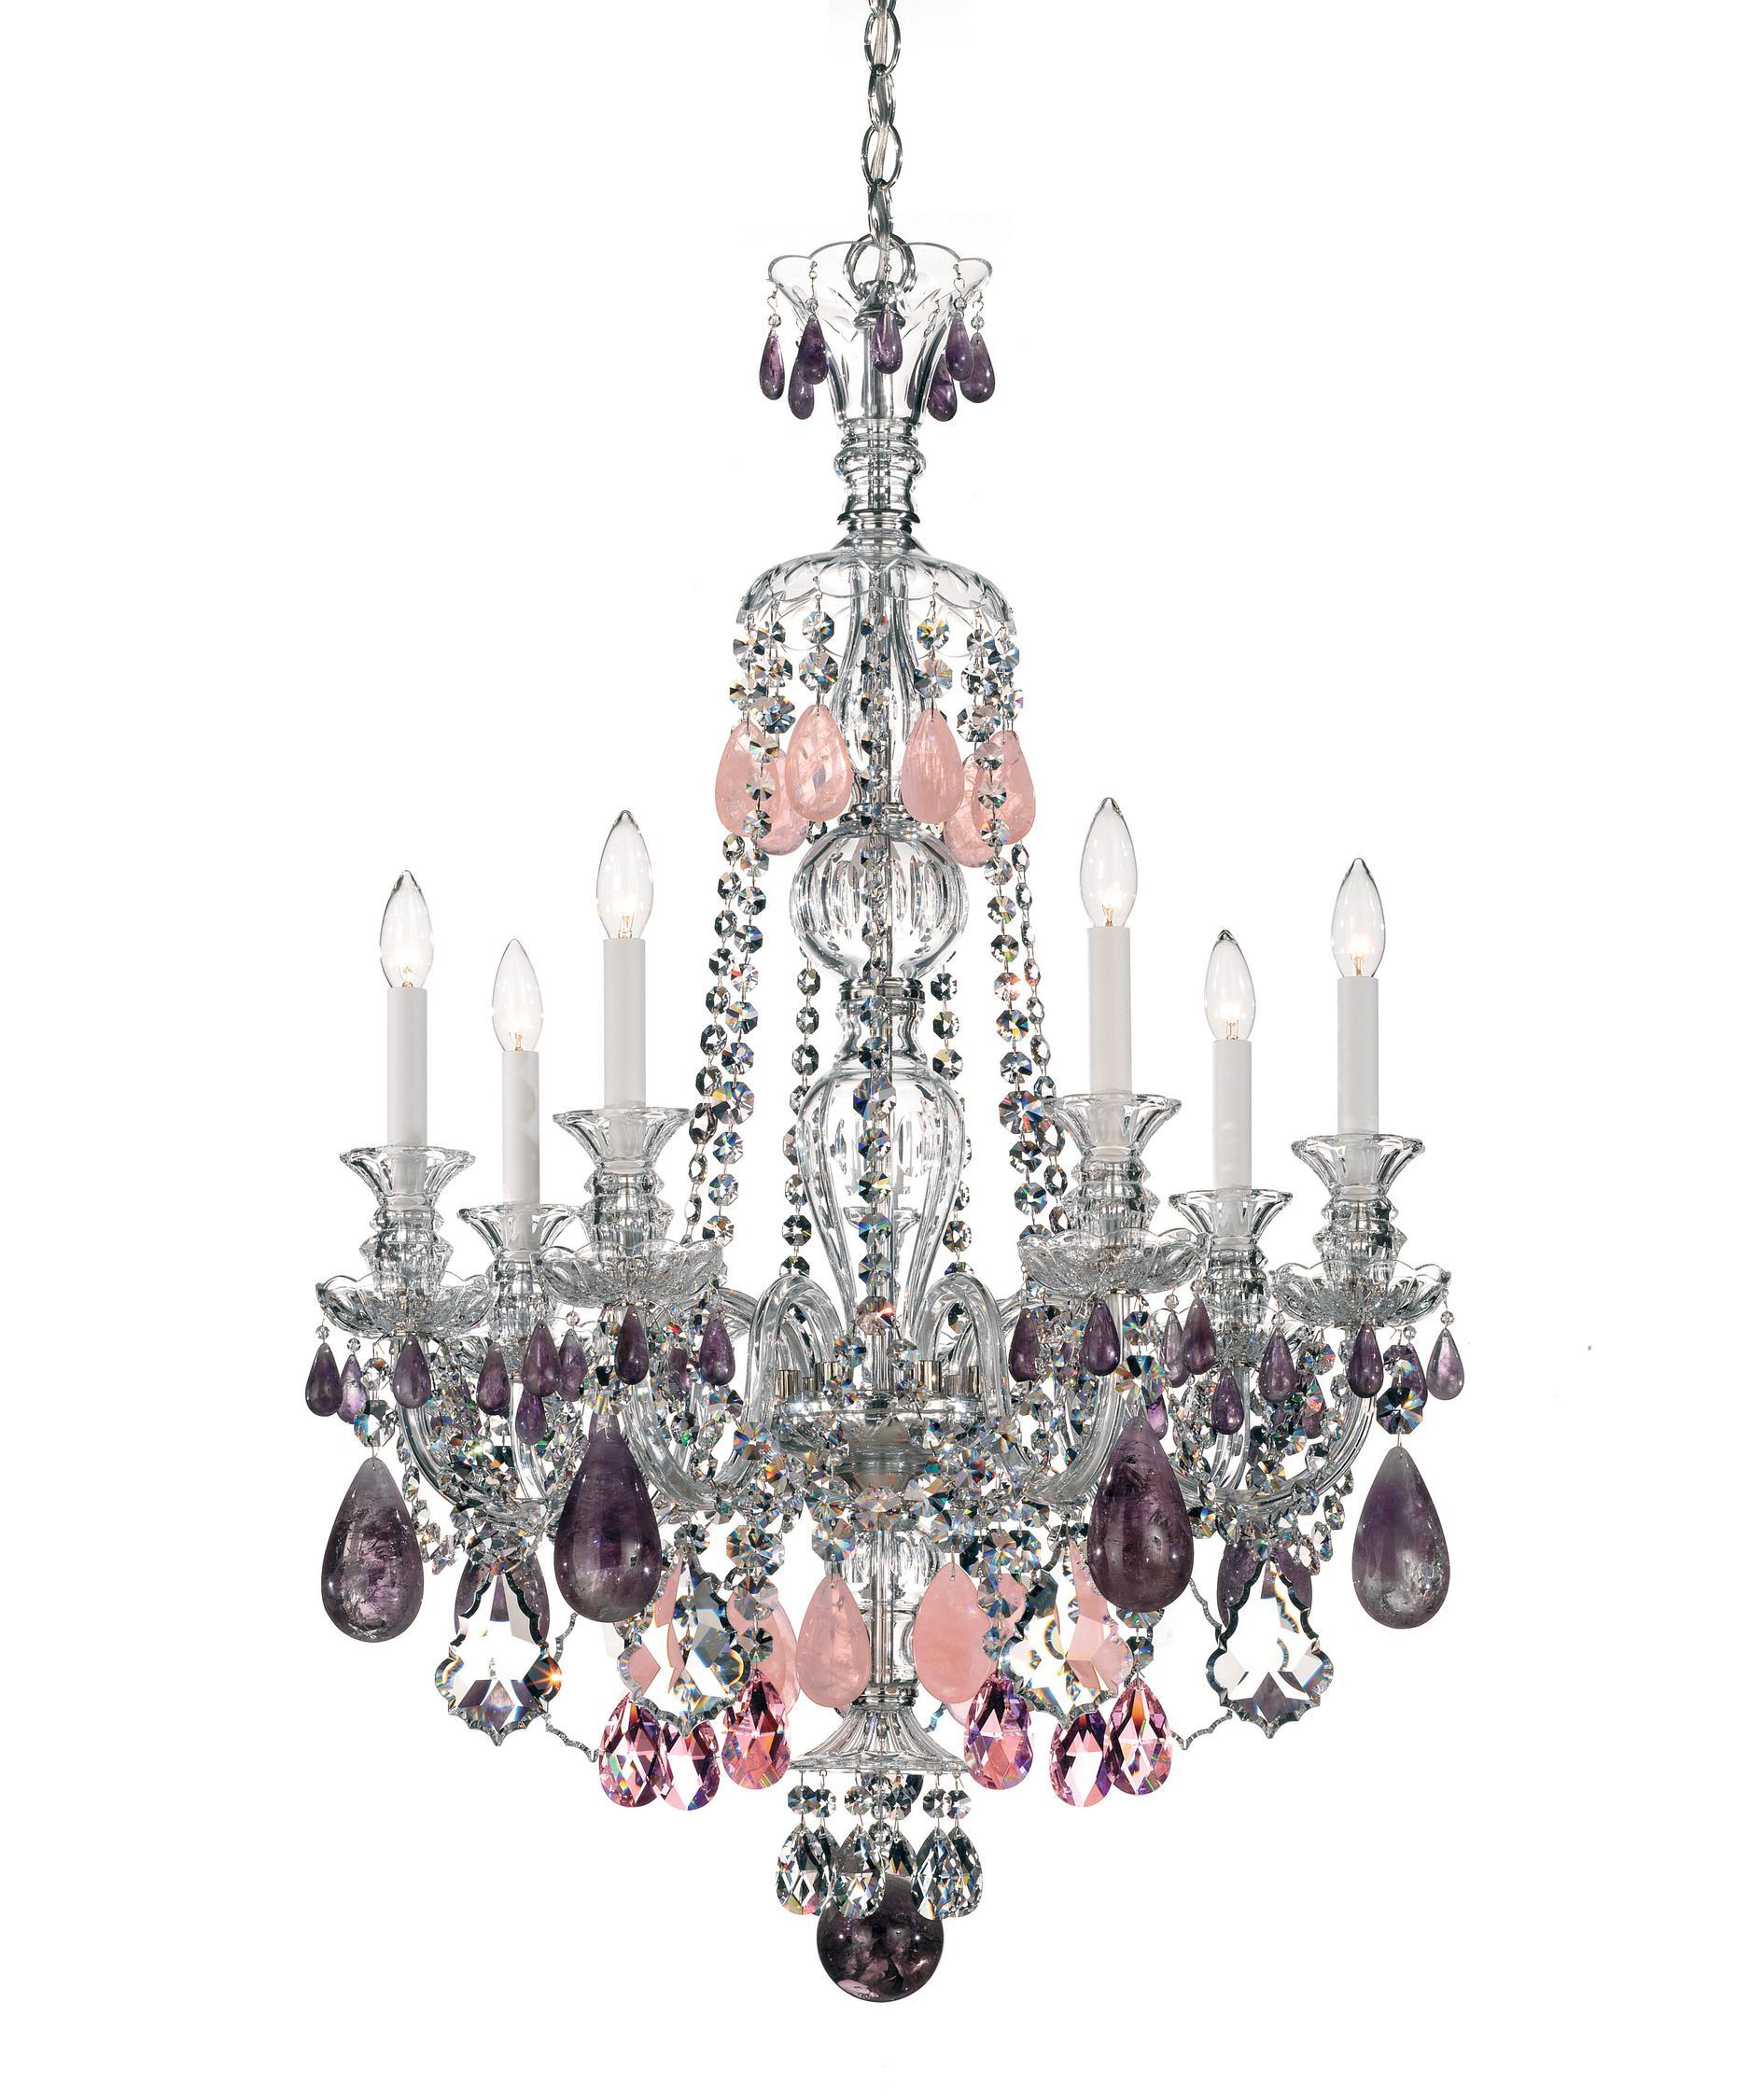 Schonbek Hamilton Rock Crystal 26 Inch Wide 7 Light Chandelier – Rock Crystal Chandelier